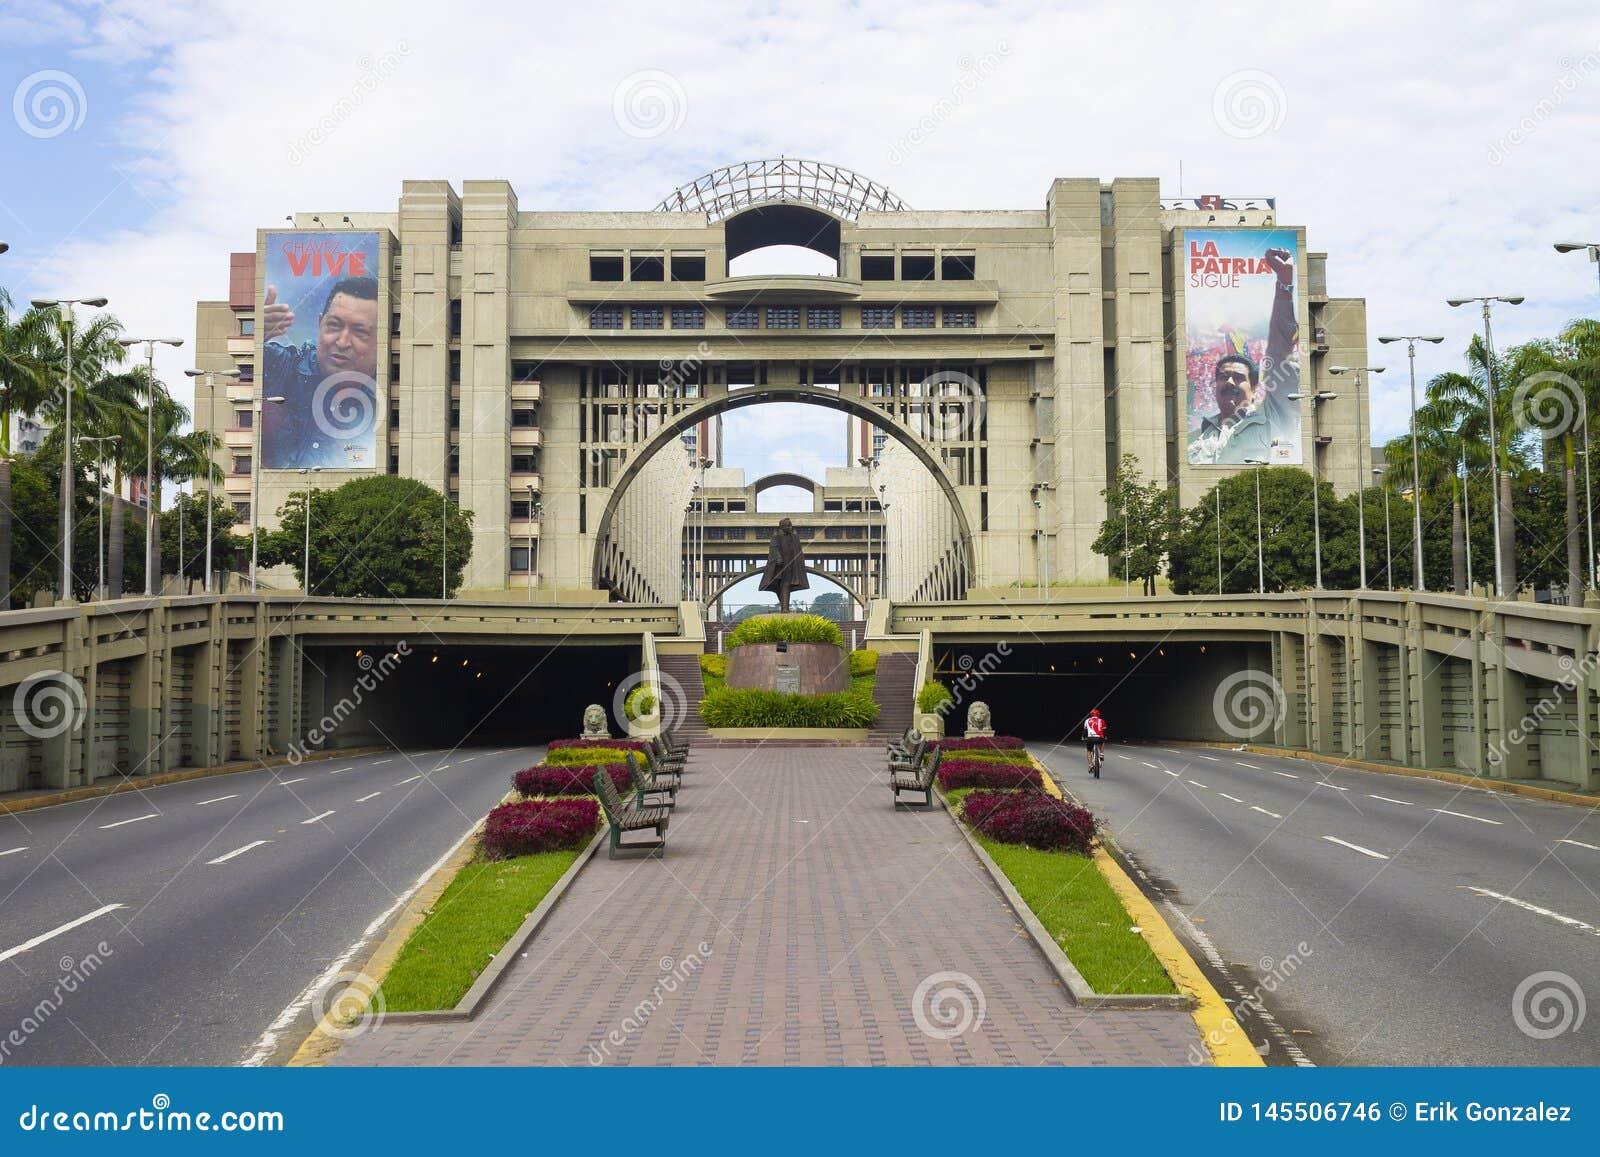 Взгляд дворца правосудия Венесуэлы в Каракасе, Венесуэле